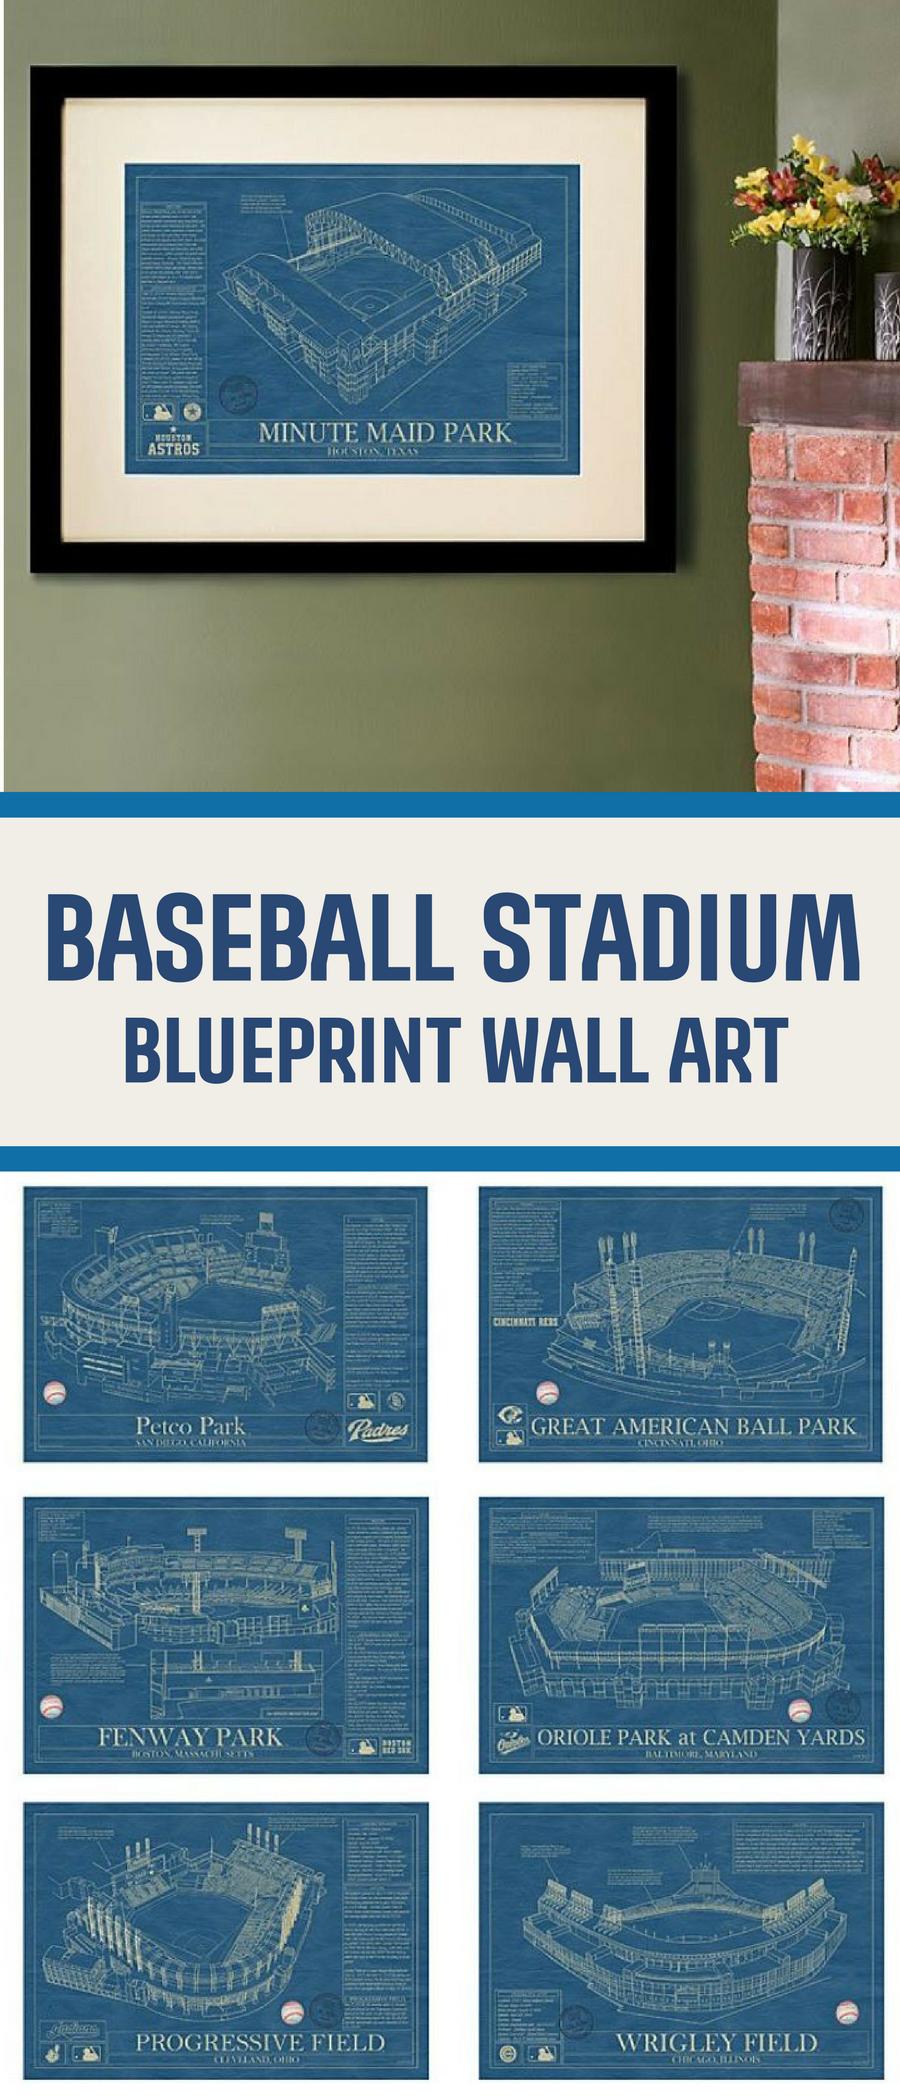 Baseball Stadium Wall Art Prints Architectural Blueprints Of